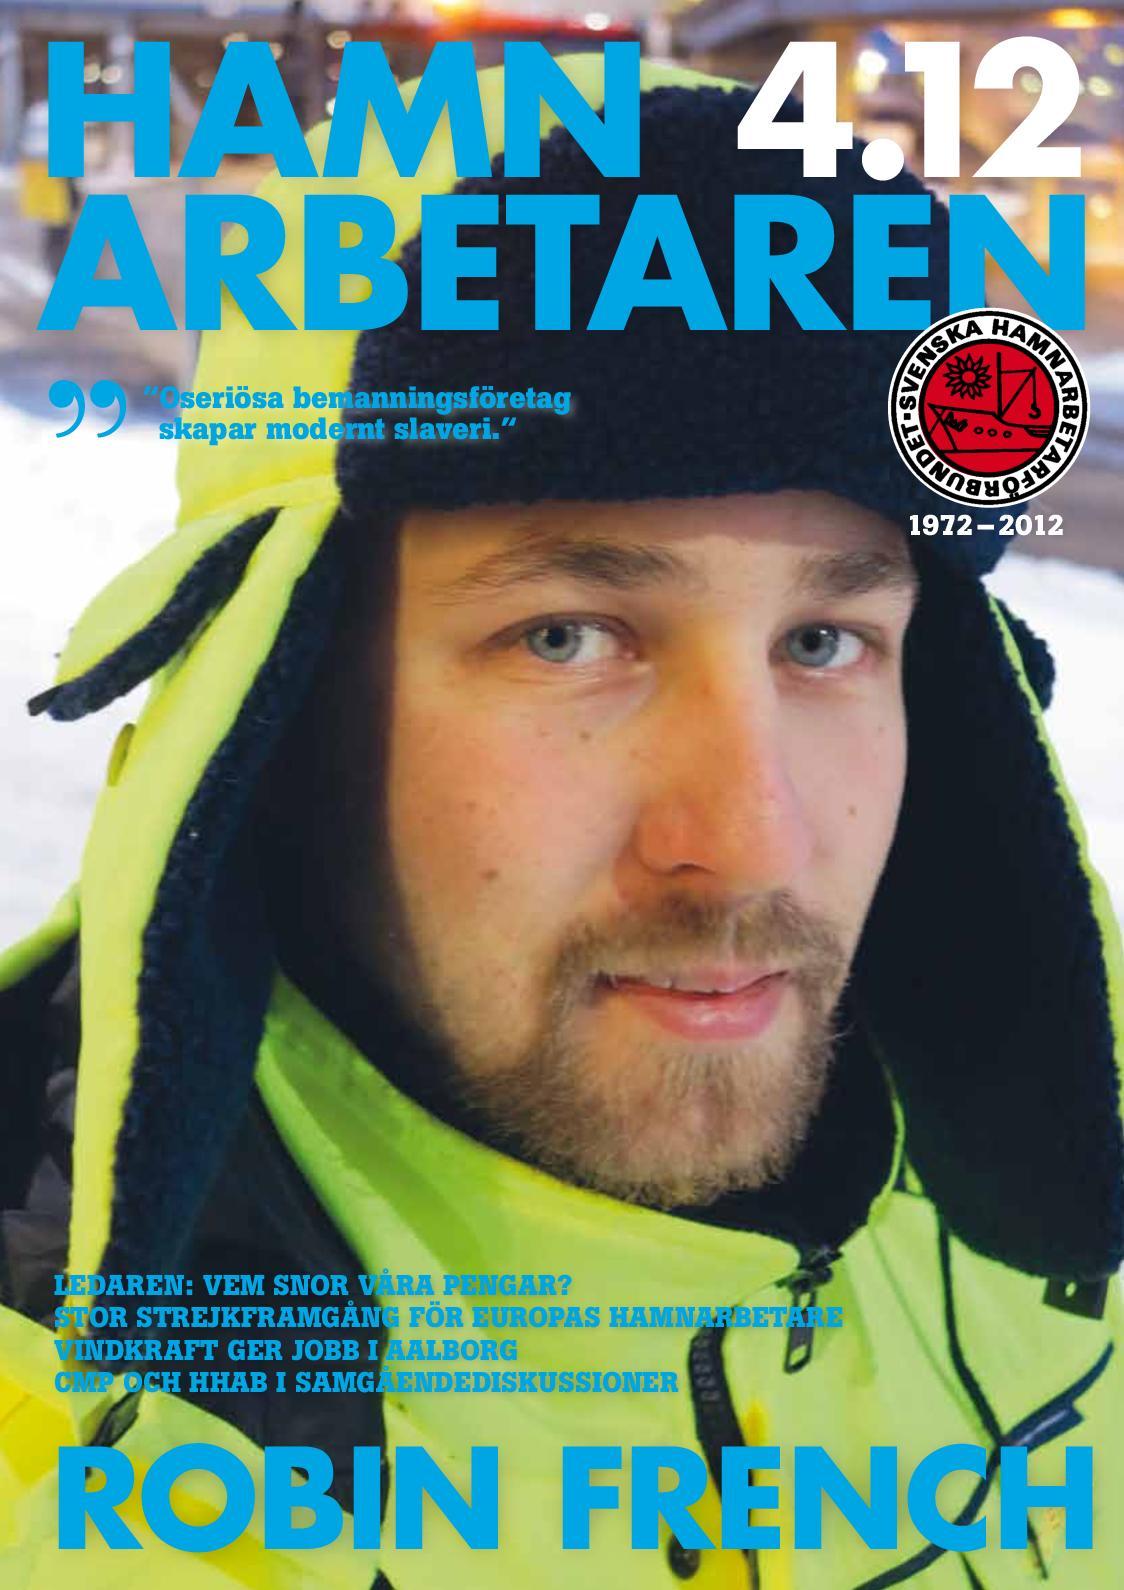 Hamnarbetare strejkar i finland